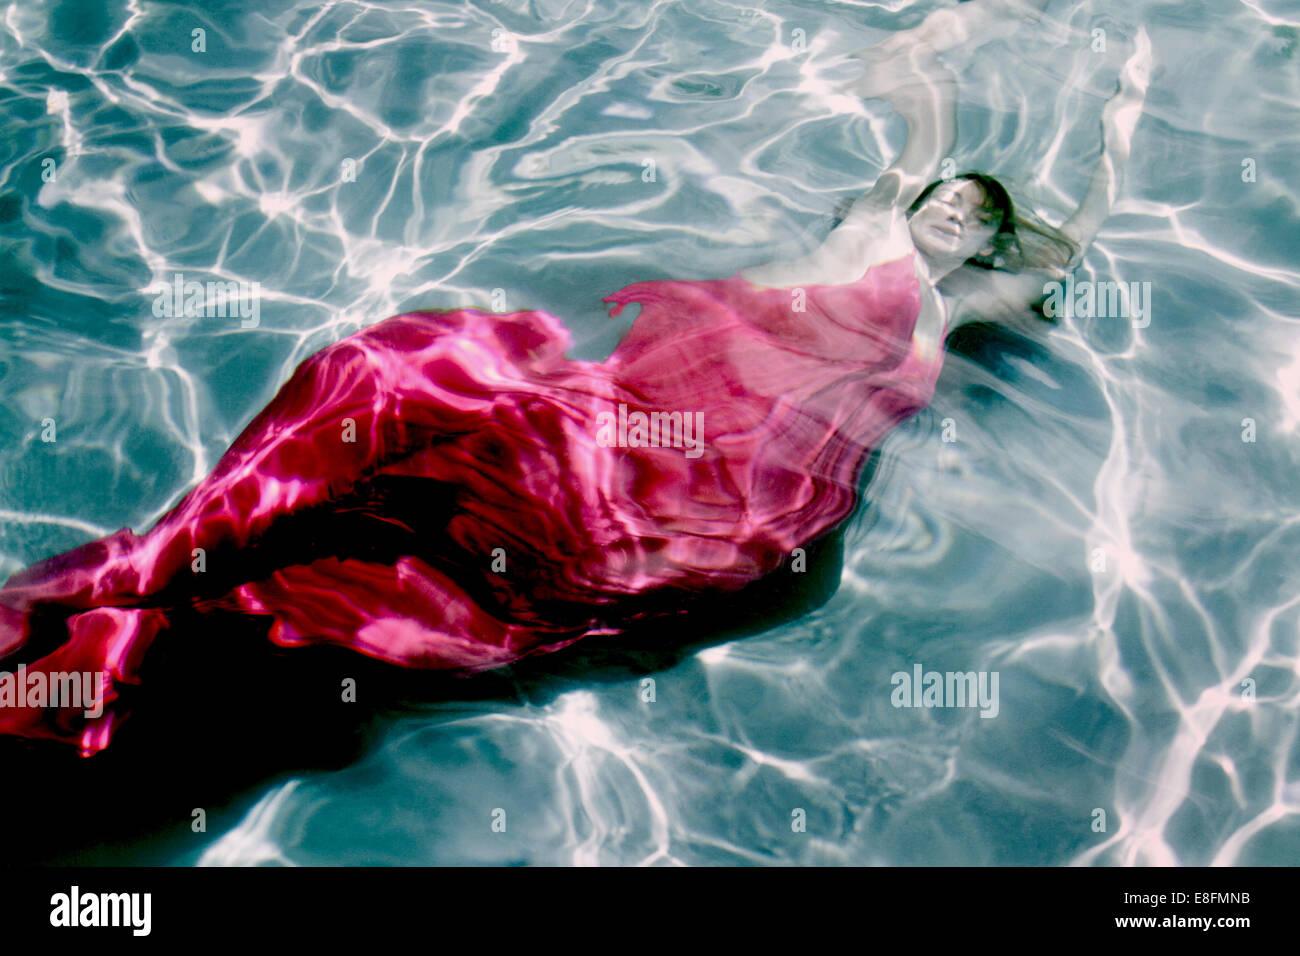 Frau im Kleid unter Wasser Stockbild